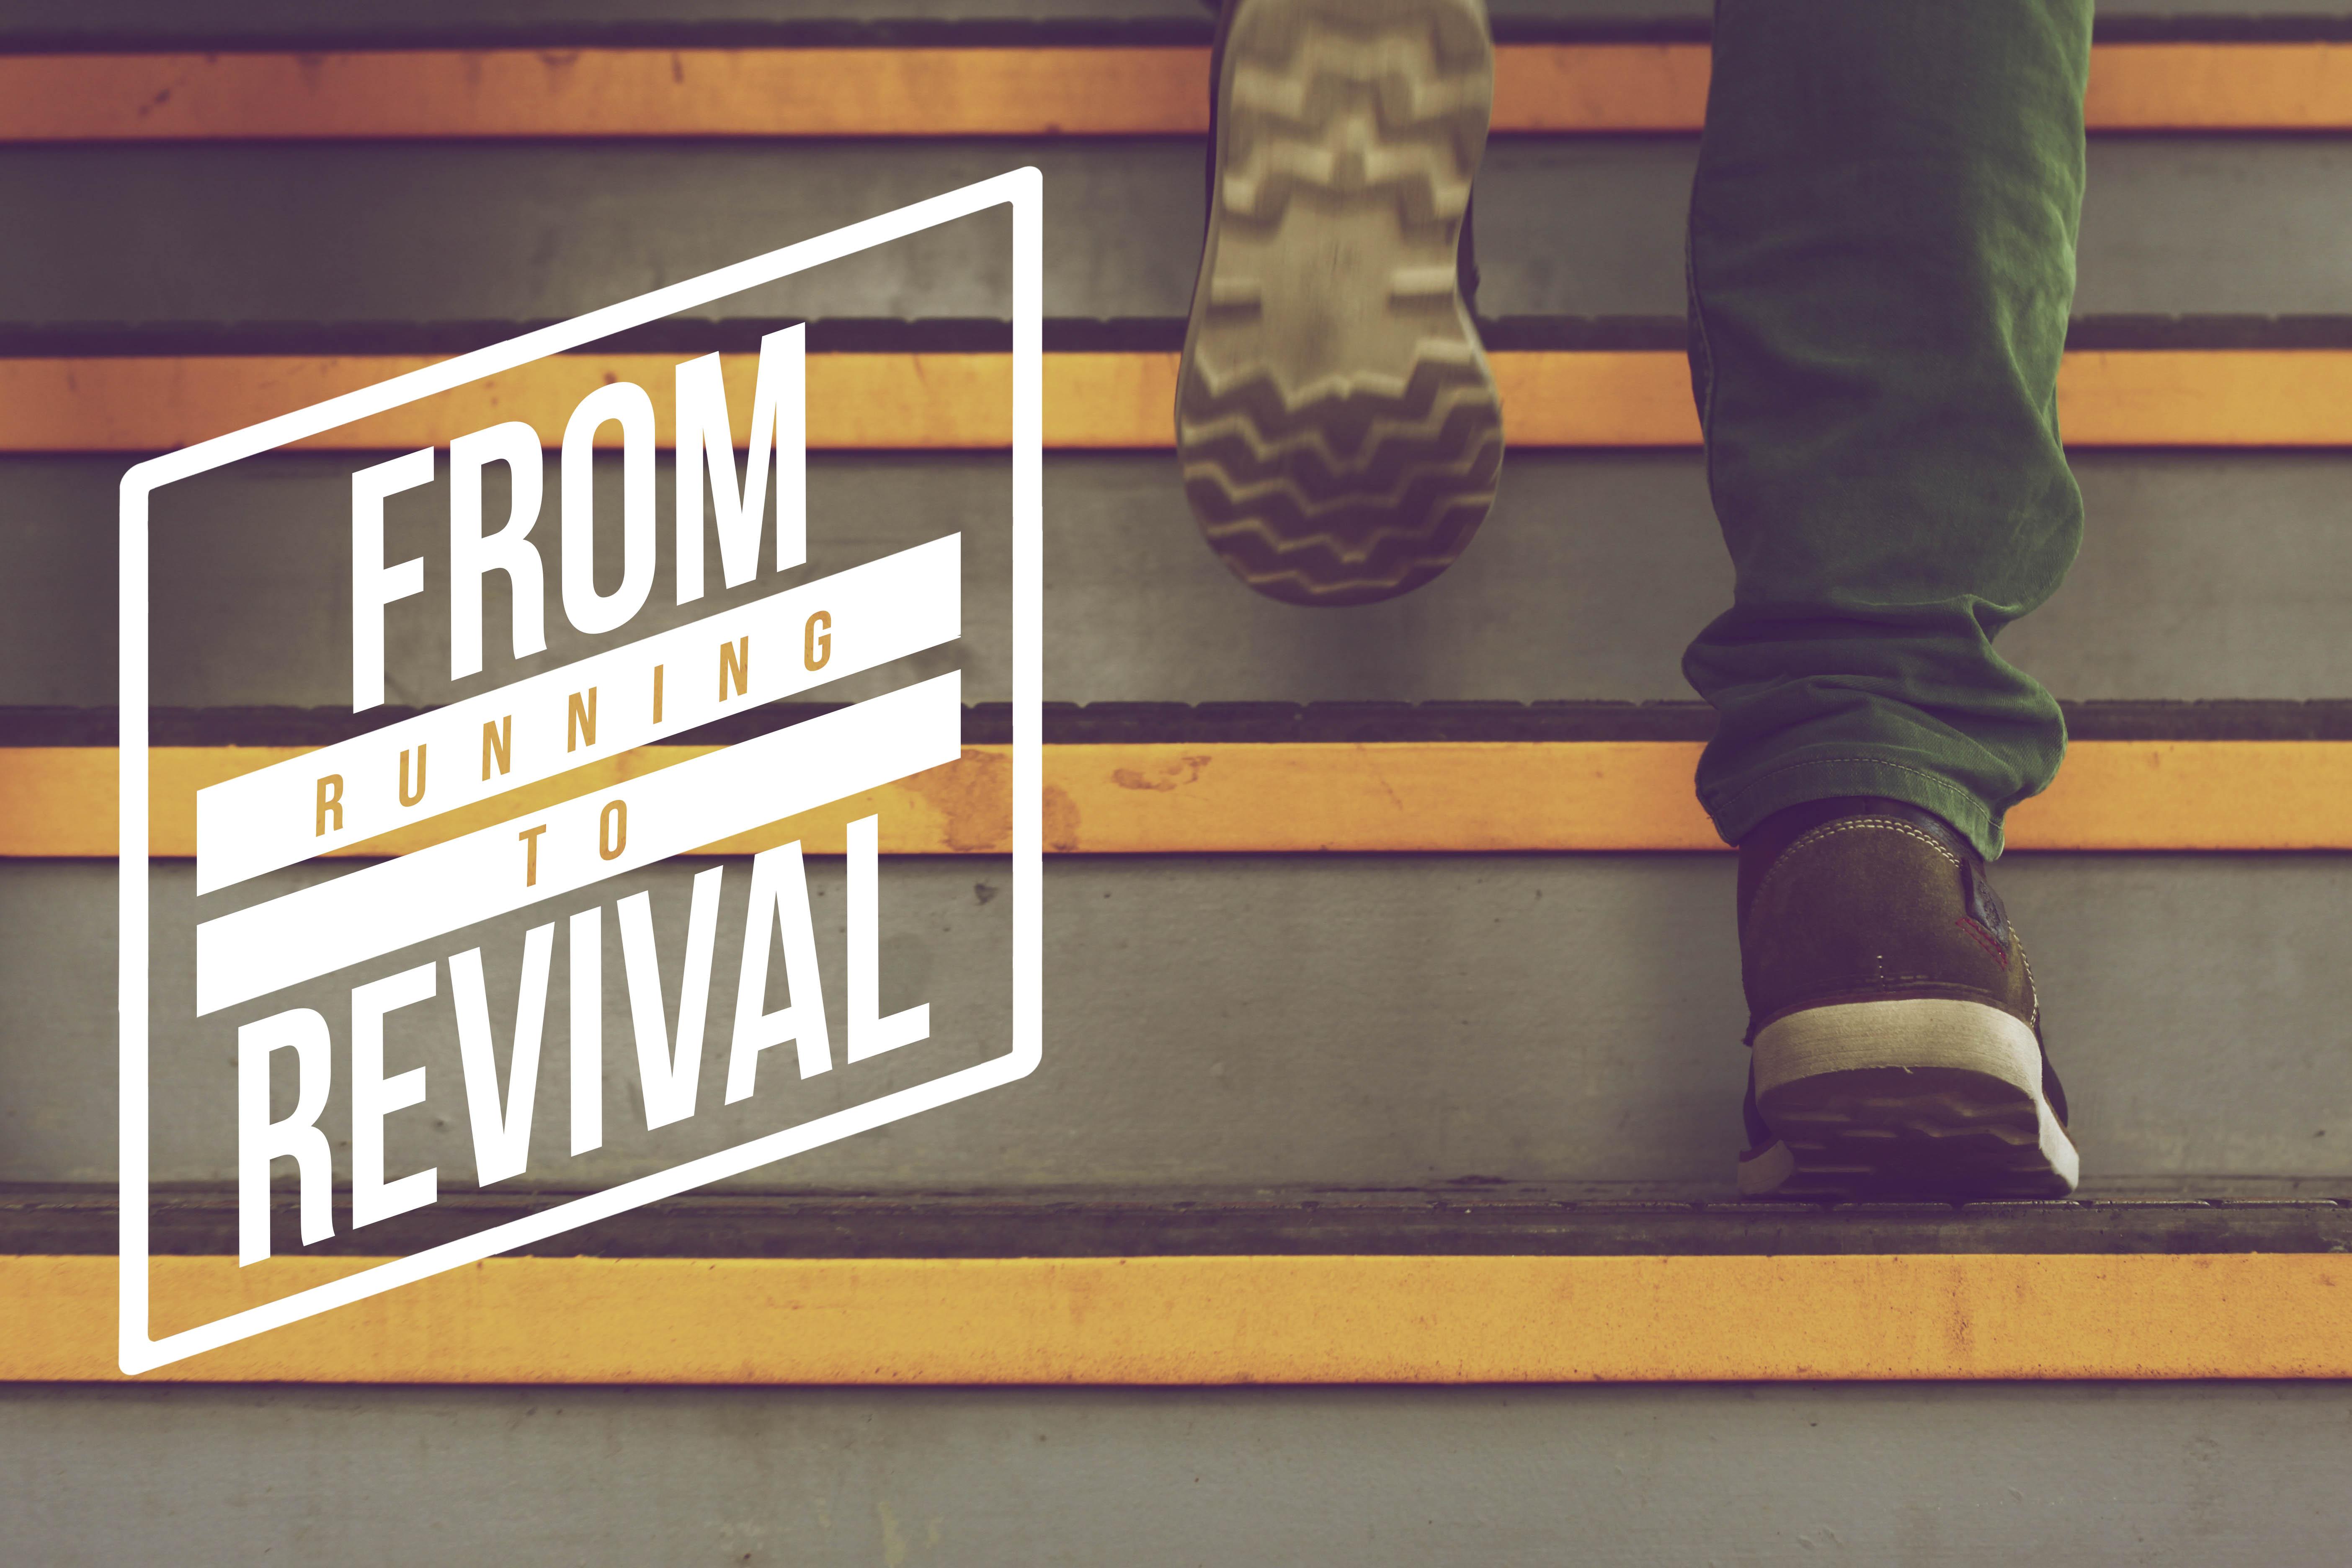 From Running to Revival Sermon Series Idea – Church Sermon